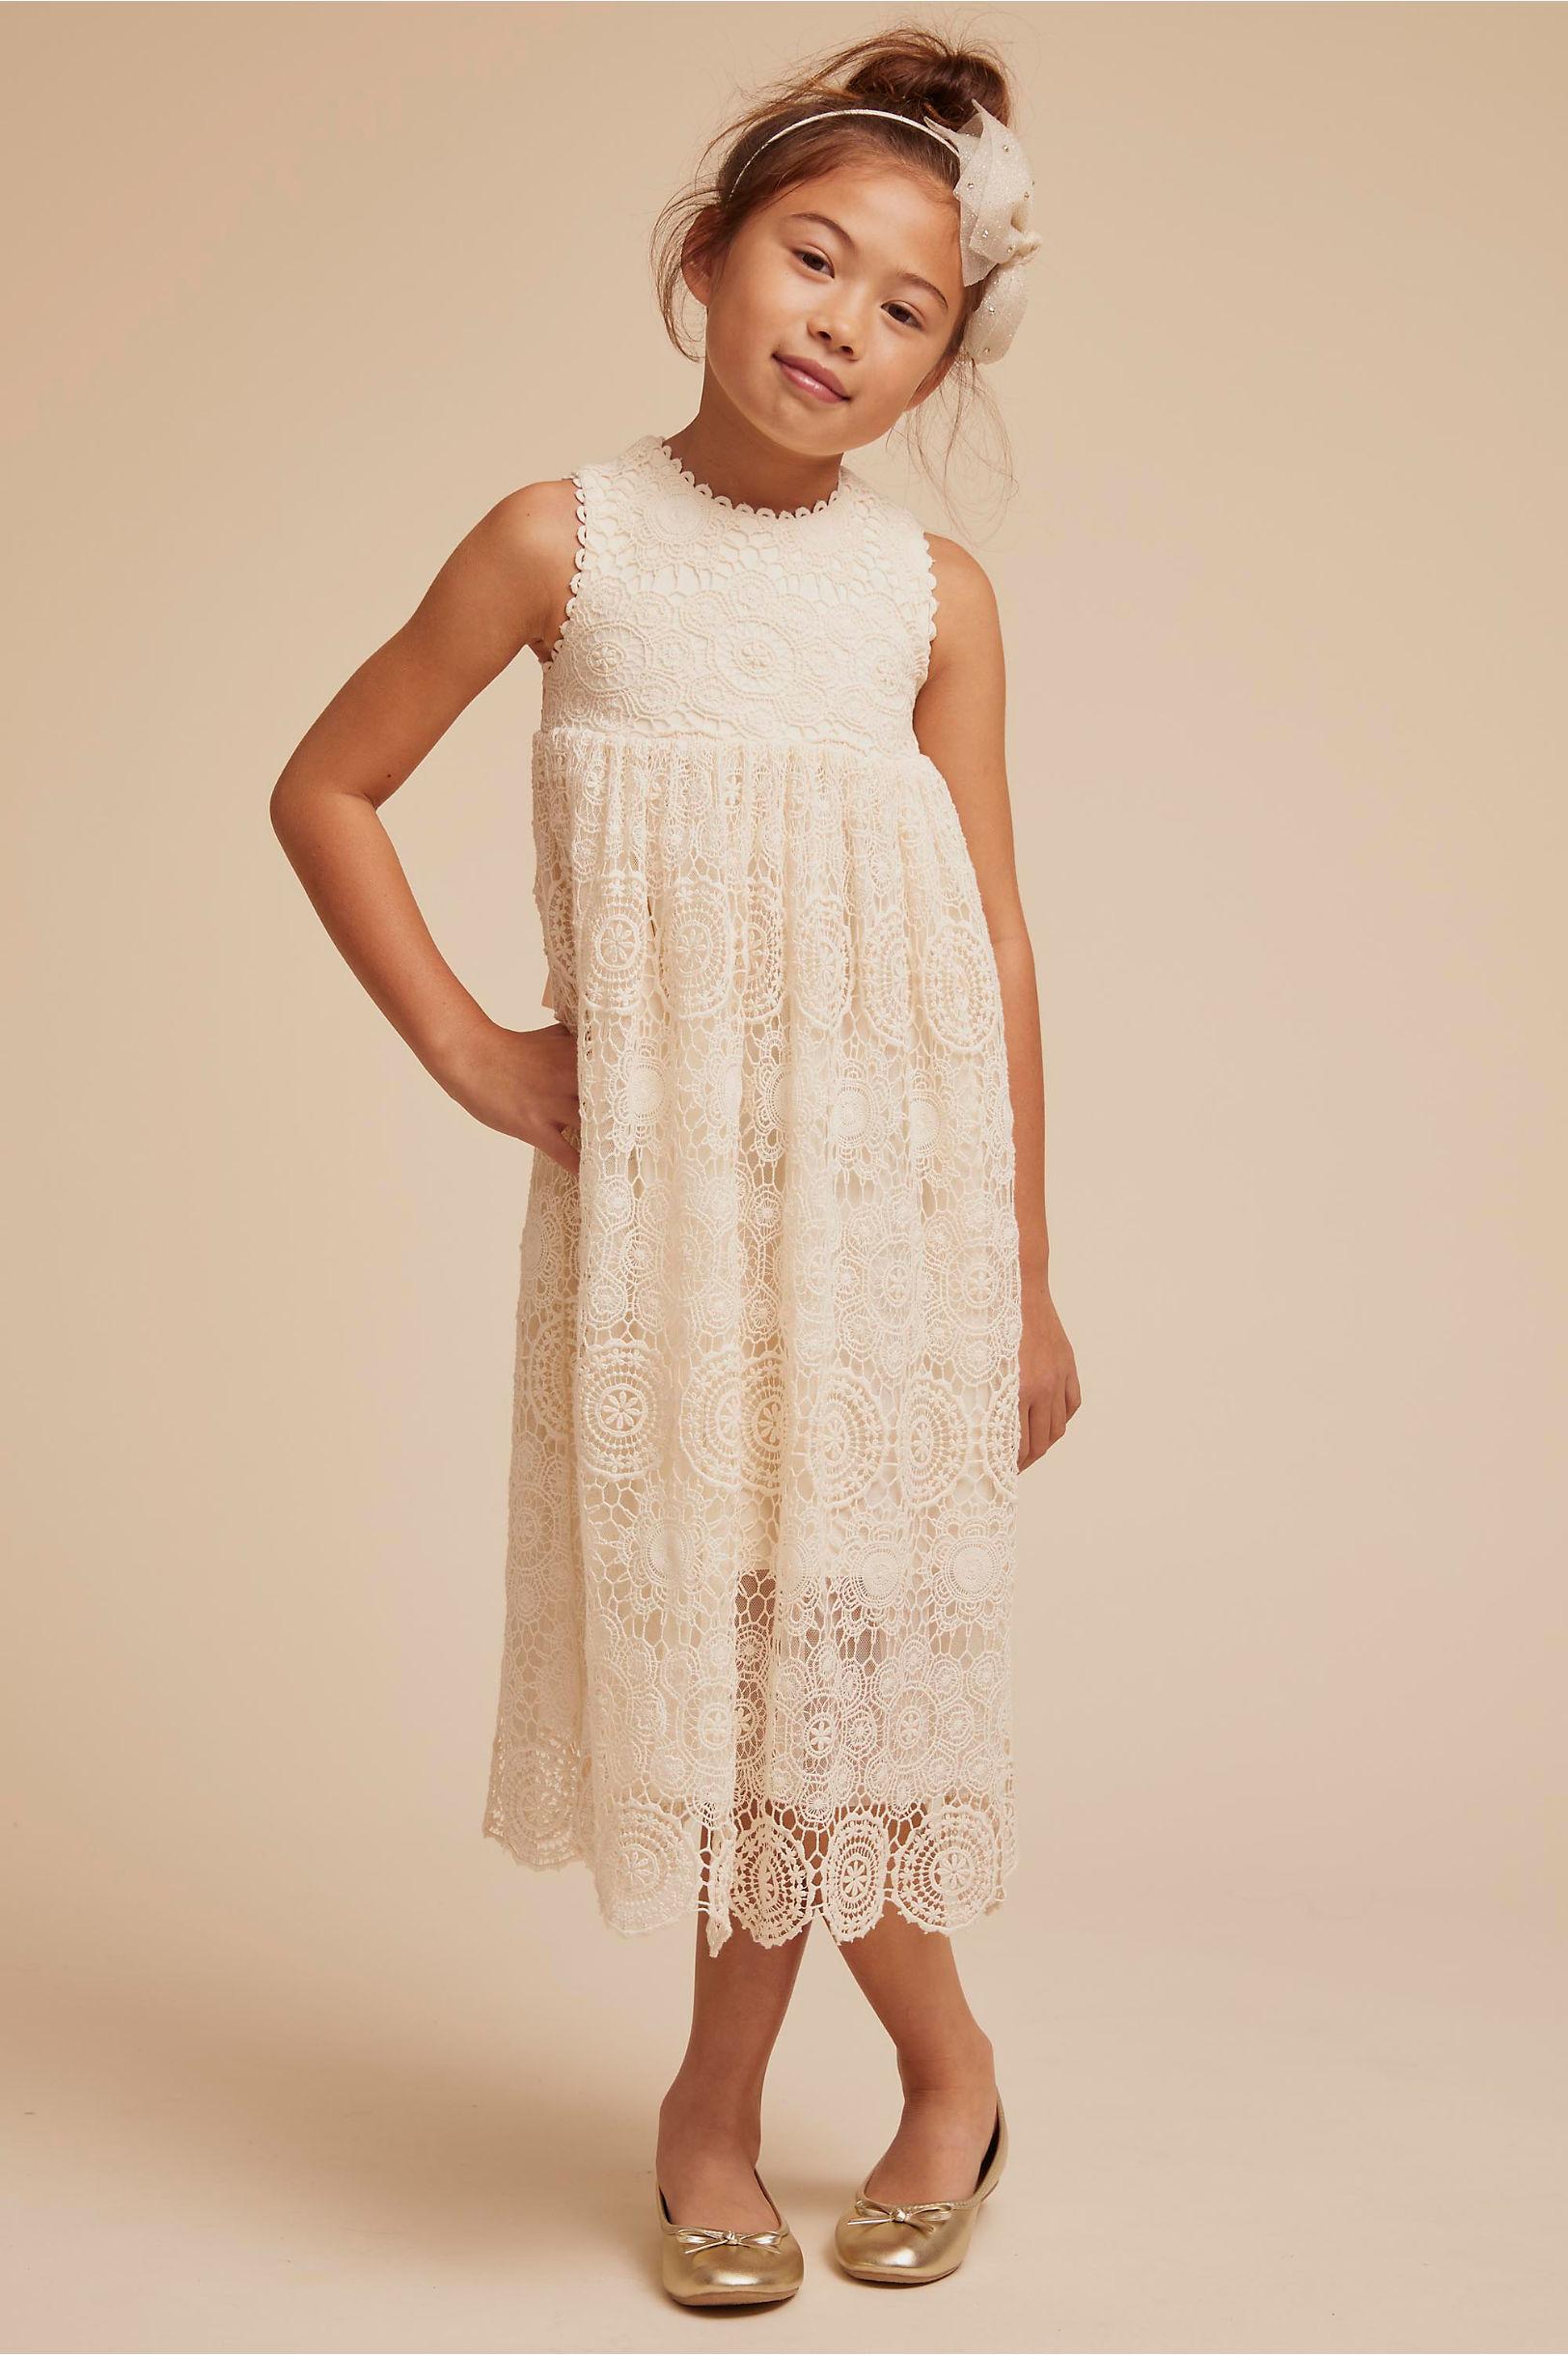 Flower girl dresses junior bridesmaid dresses bhldn tia dress ombrellifo Choice Image